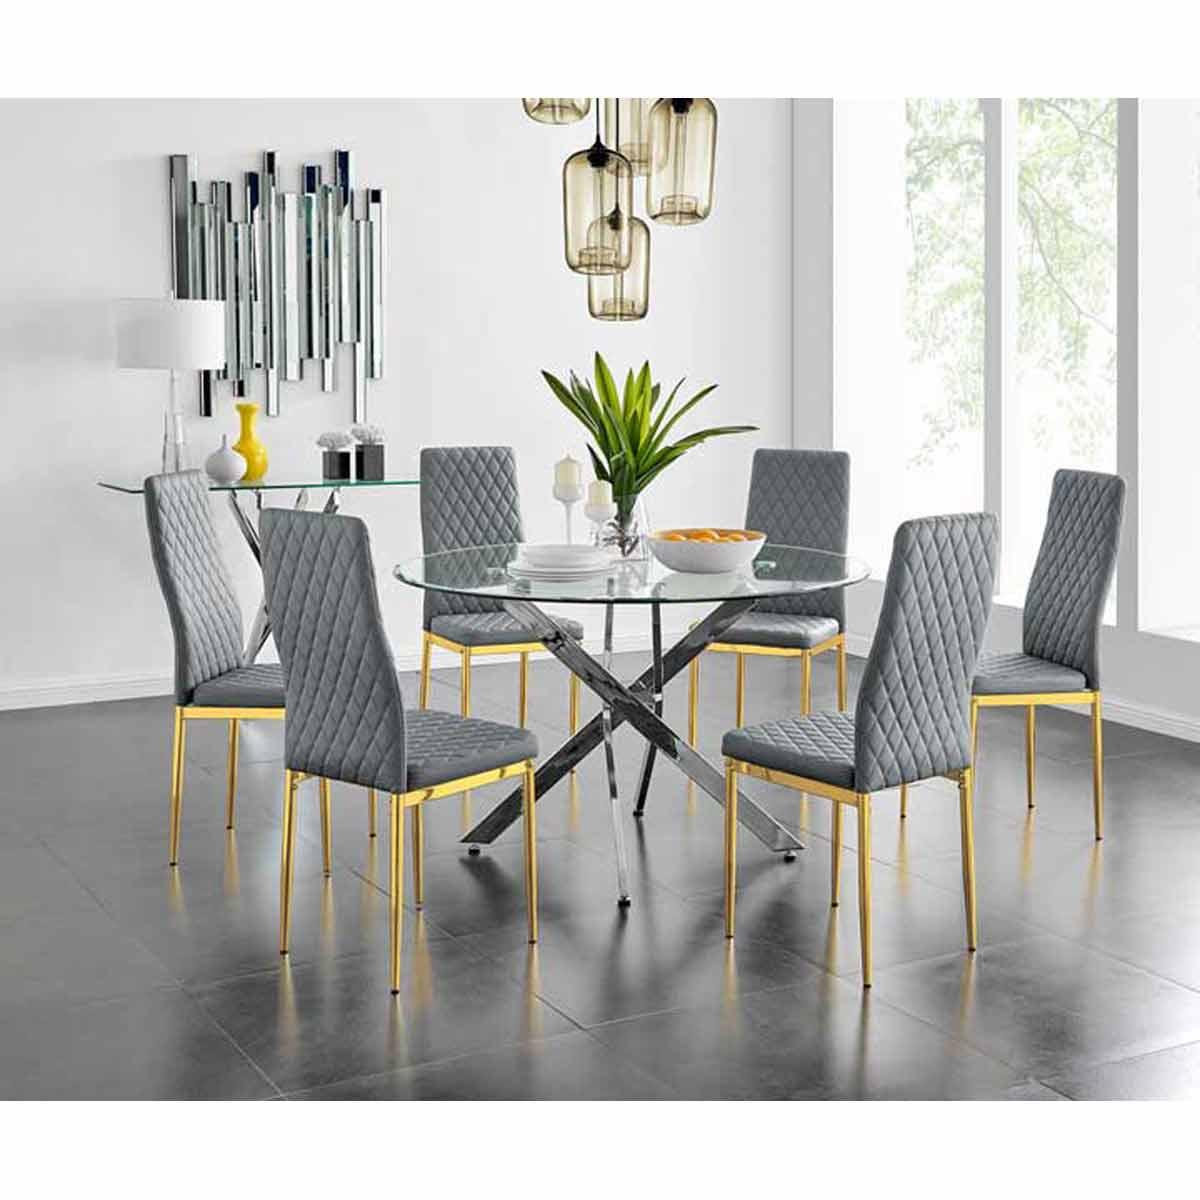 Furniture Box Novara 120cm Round Dining Table and 6 Grey Gold Leg Milan Chairs